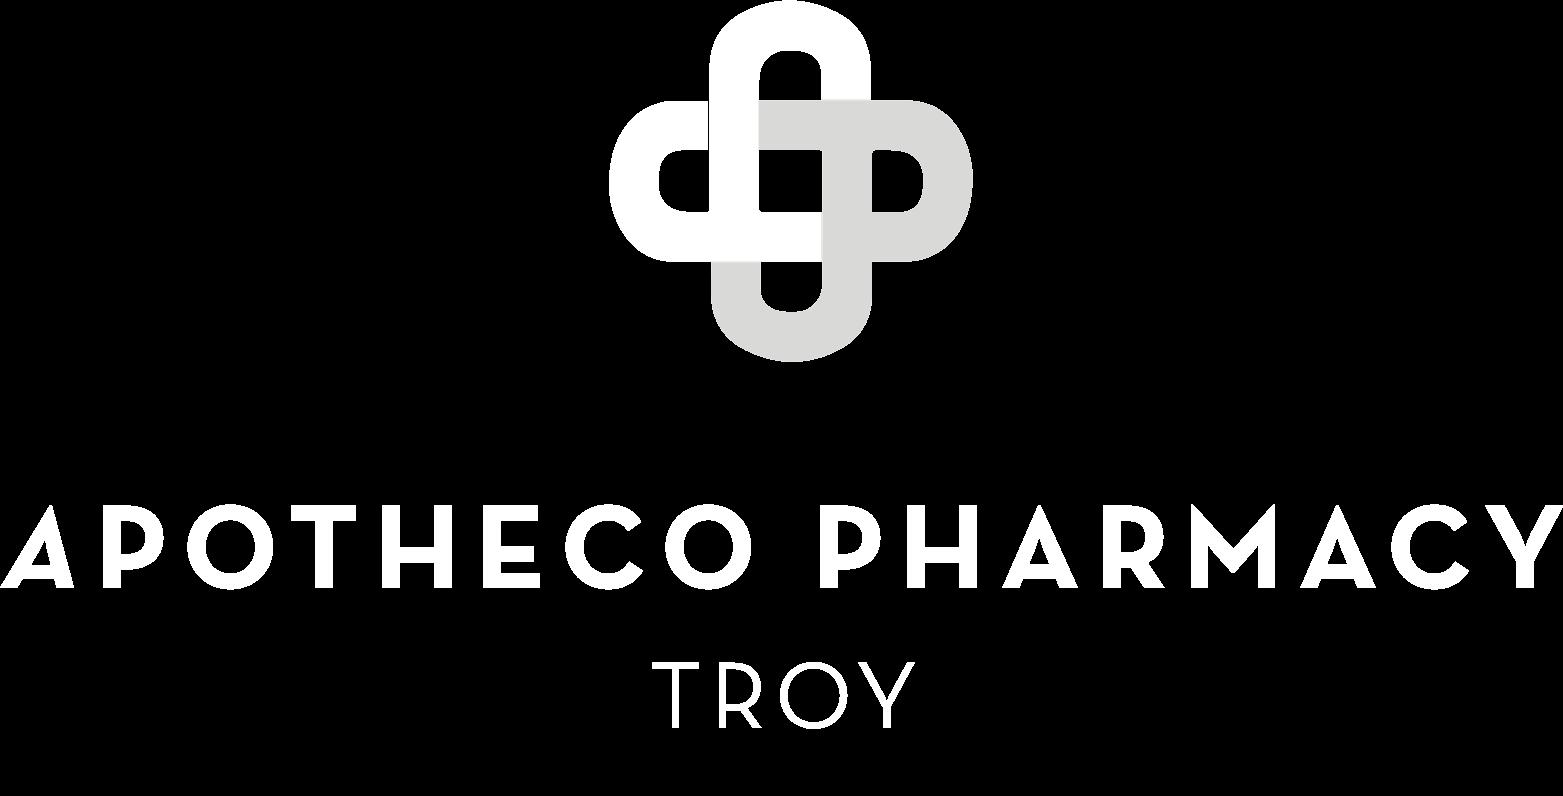 Apotheco Pharmacy Troy